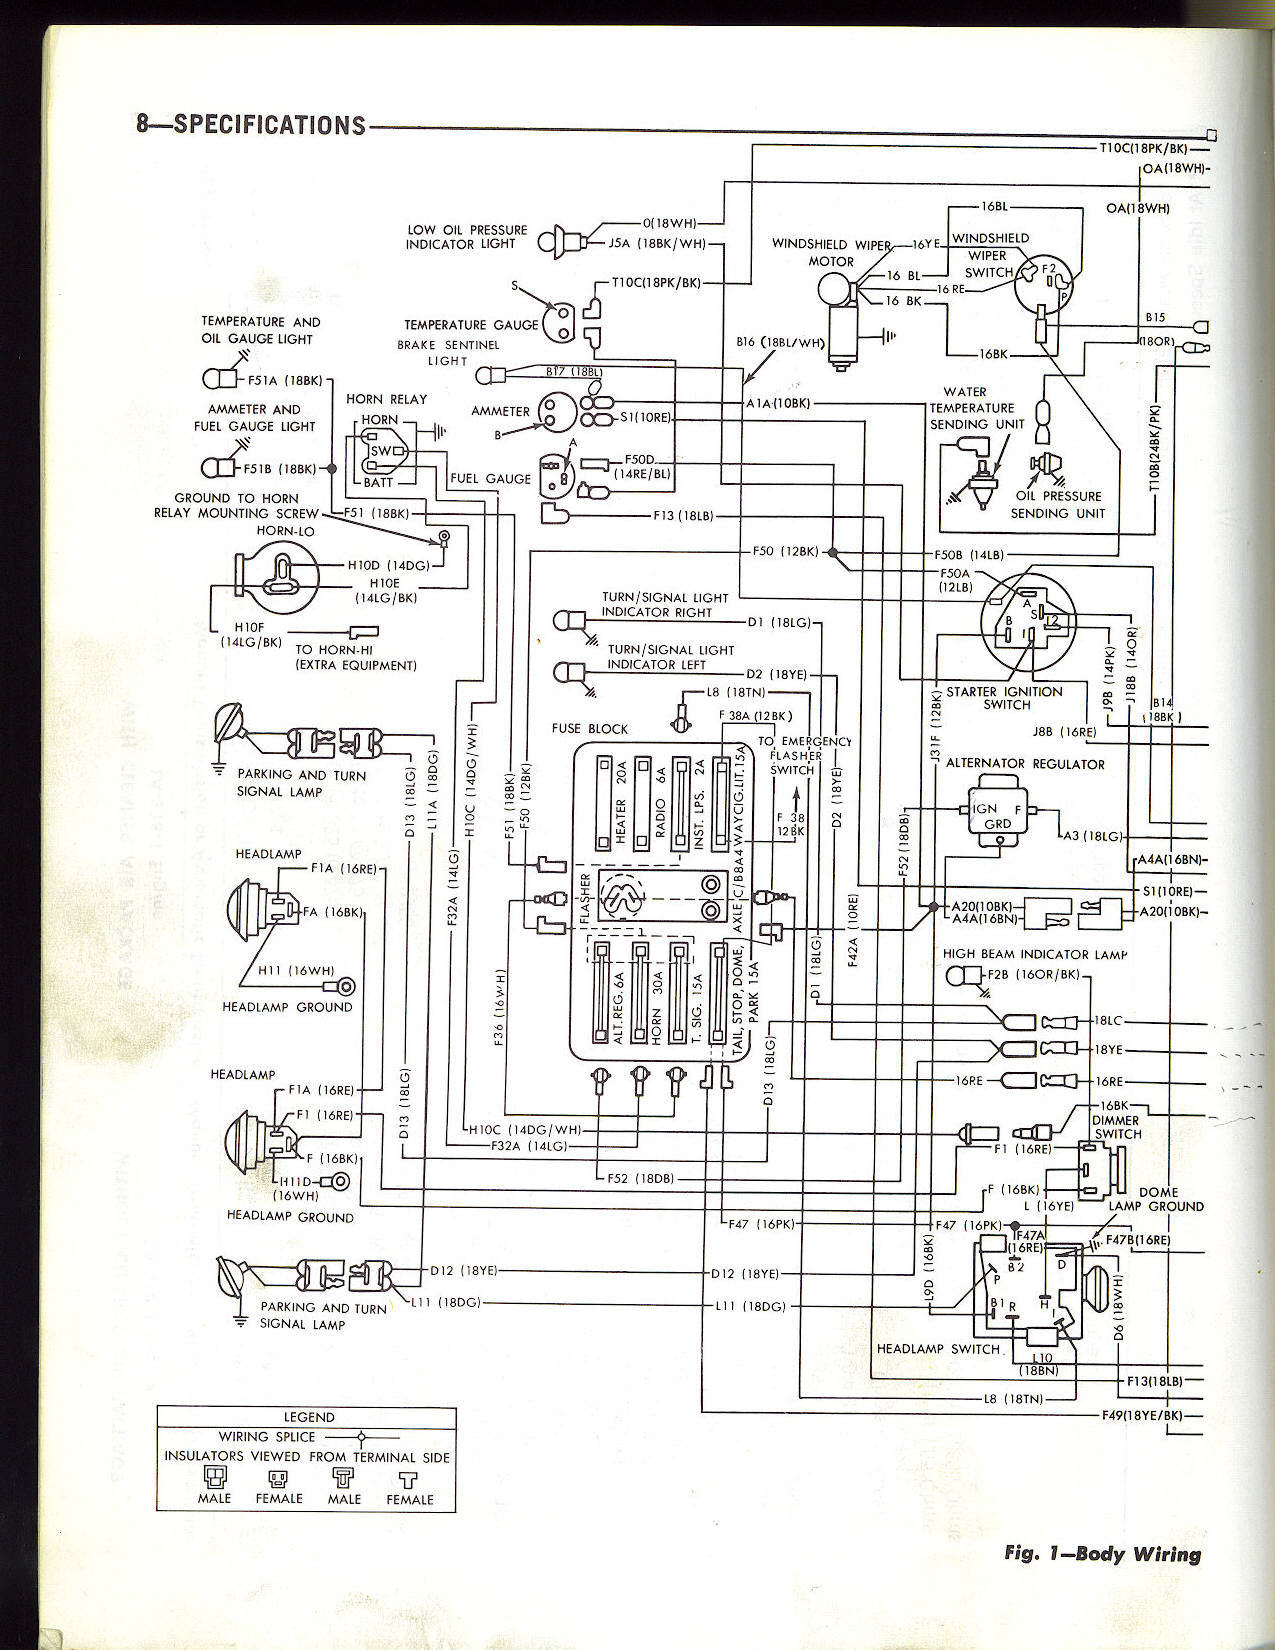 1970 dodge a100 wiring diagram 69 a100 wiring diagram help please   dodgetalk forum  69 a100 wiring diagram help please